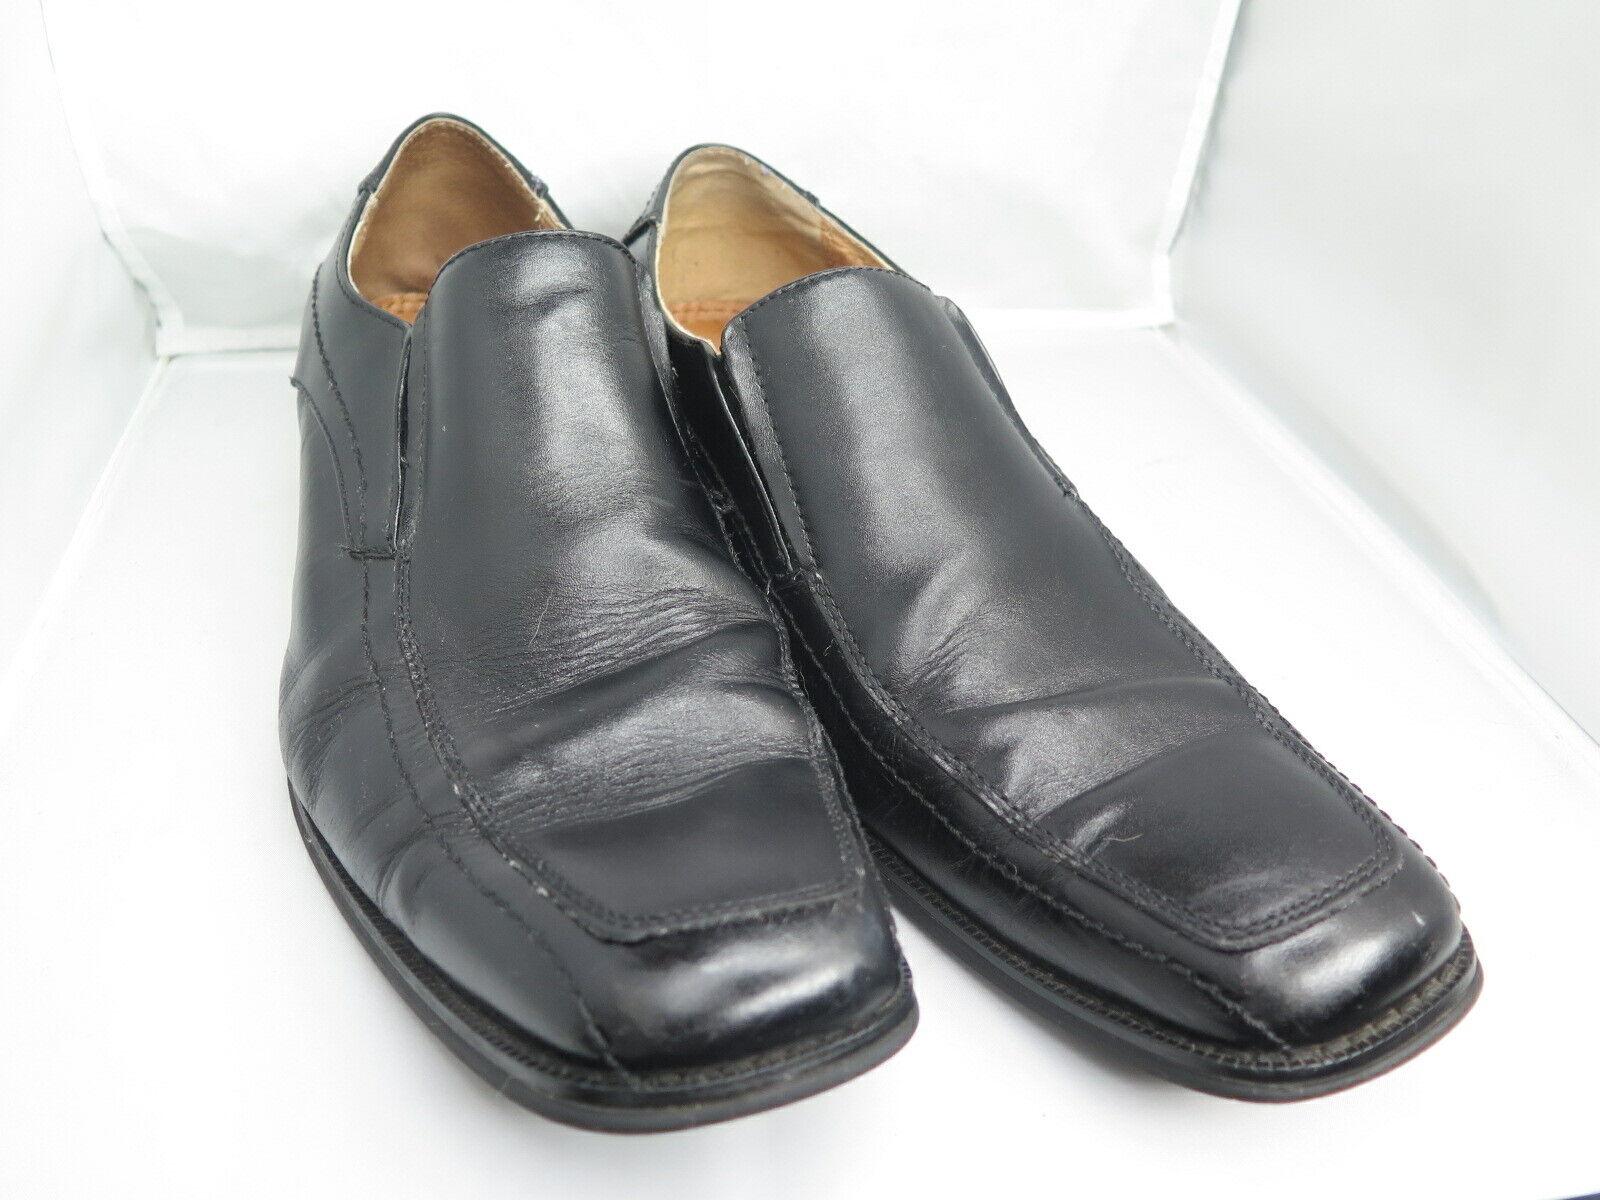 Joseph Abboud Mens Black Leather Slip On Dress Shoes X173421 Size 13M